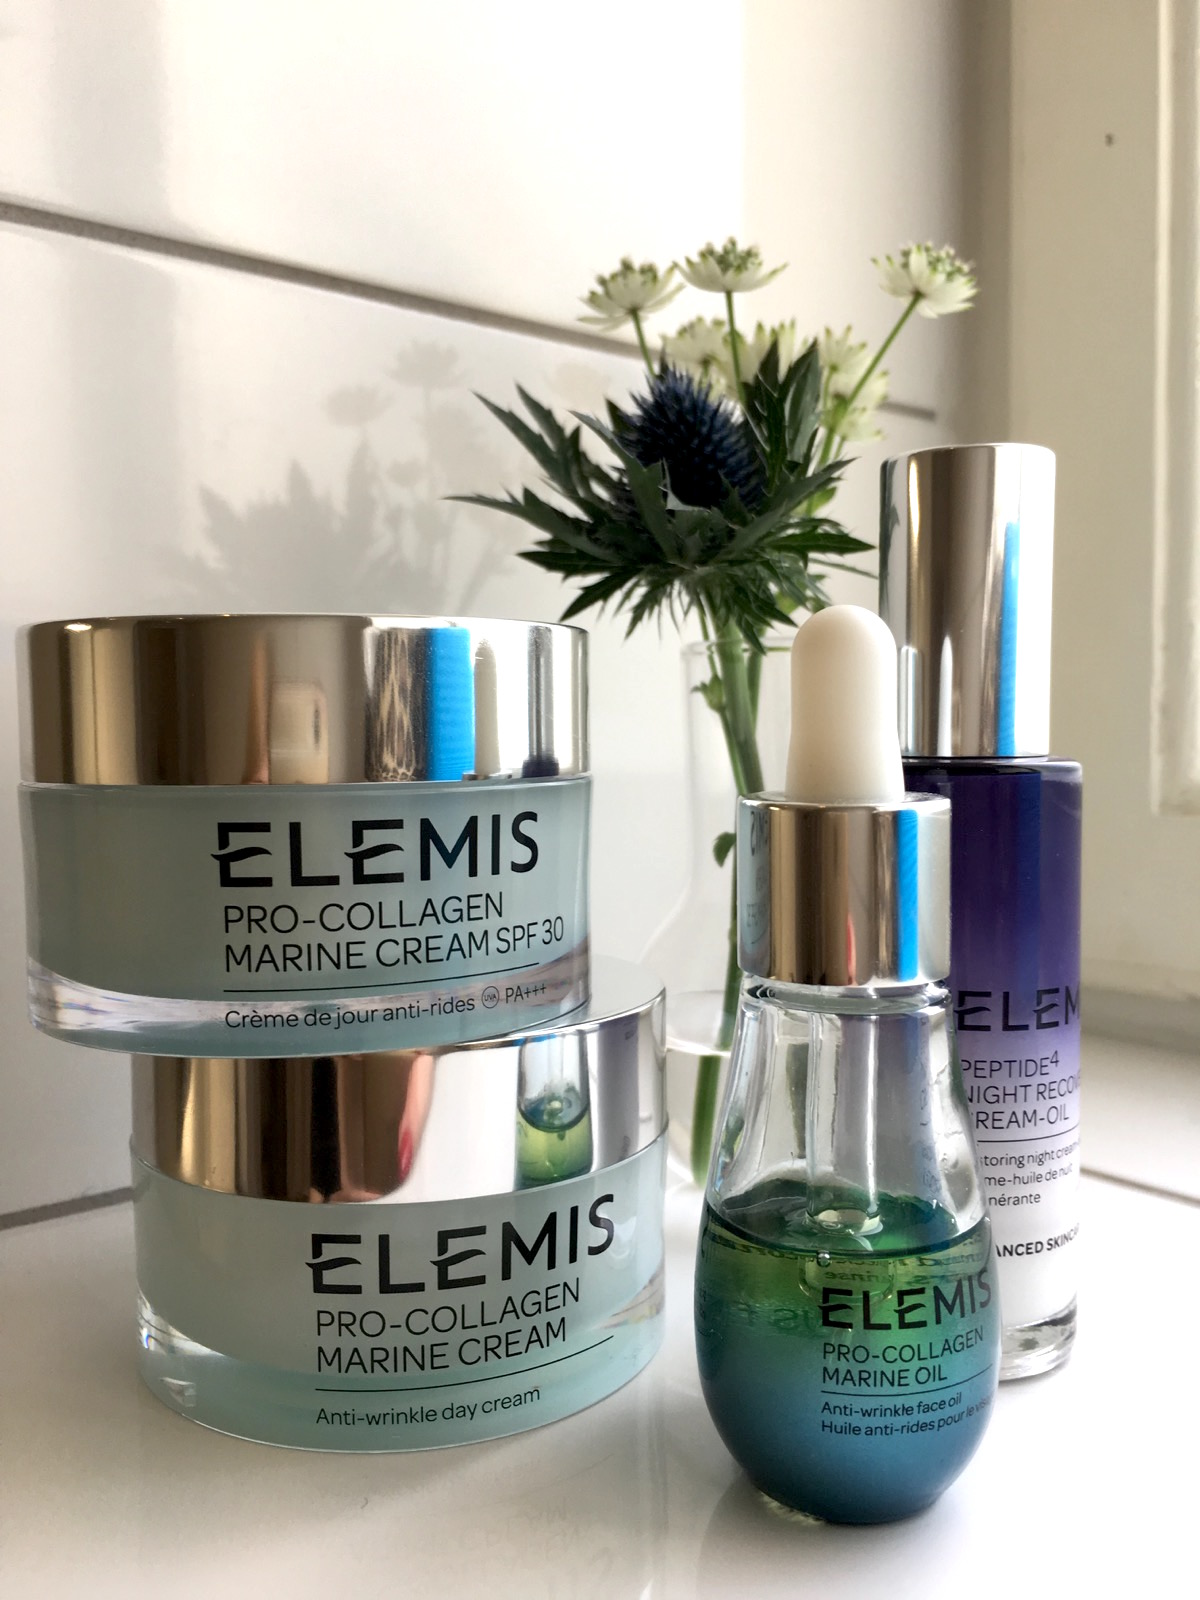 Nyheter från Elemis 2017, skönhetssnack.se IMG_8597